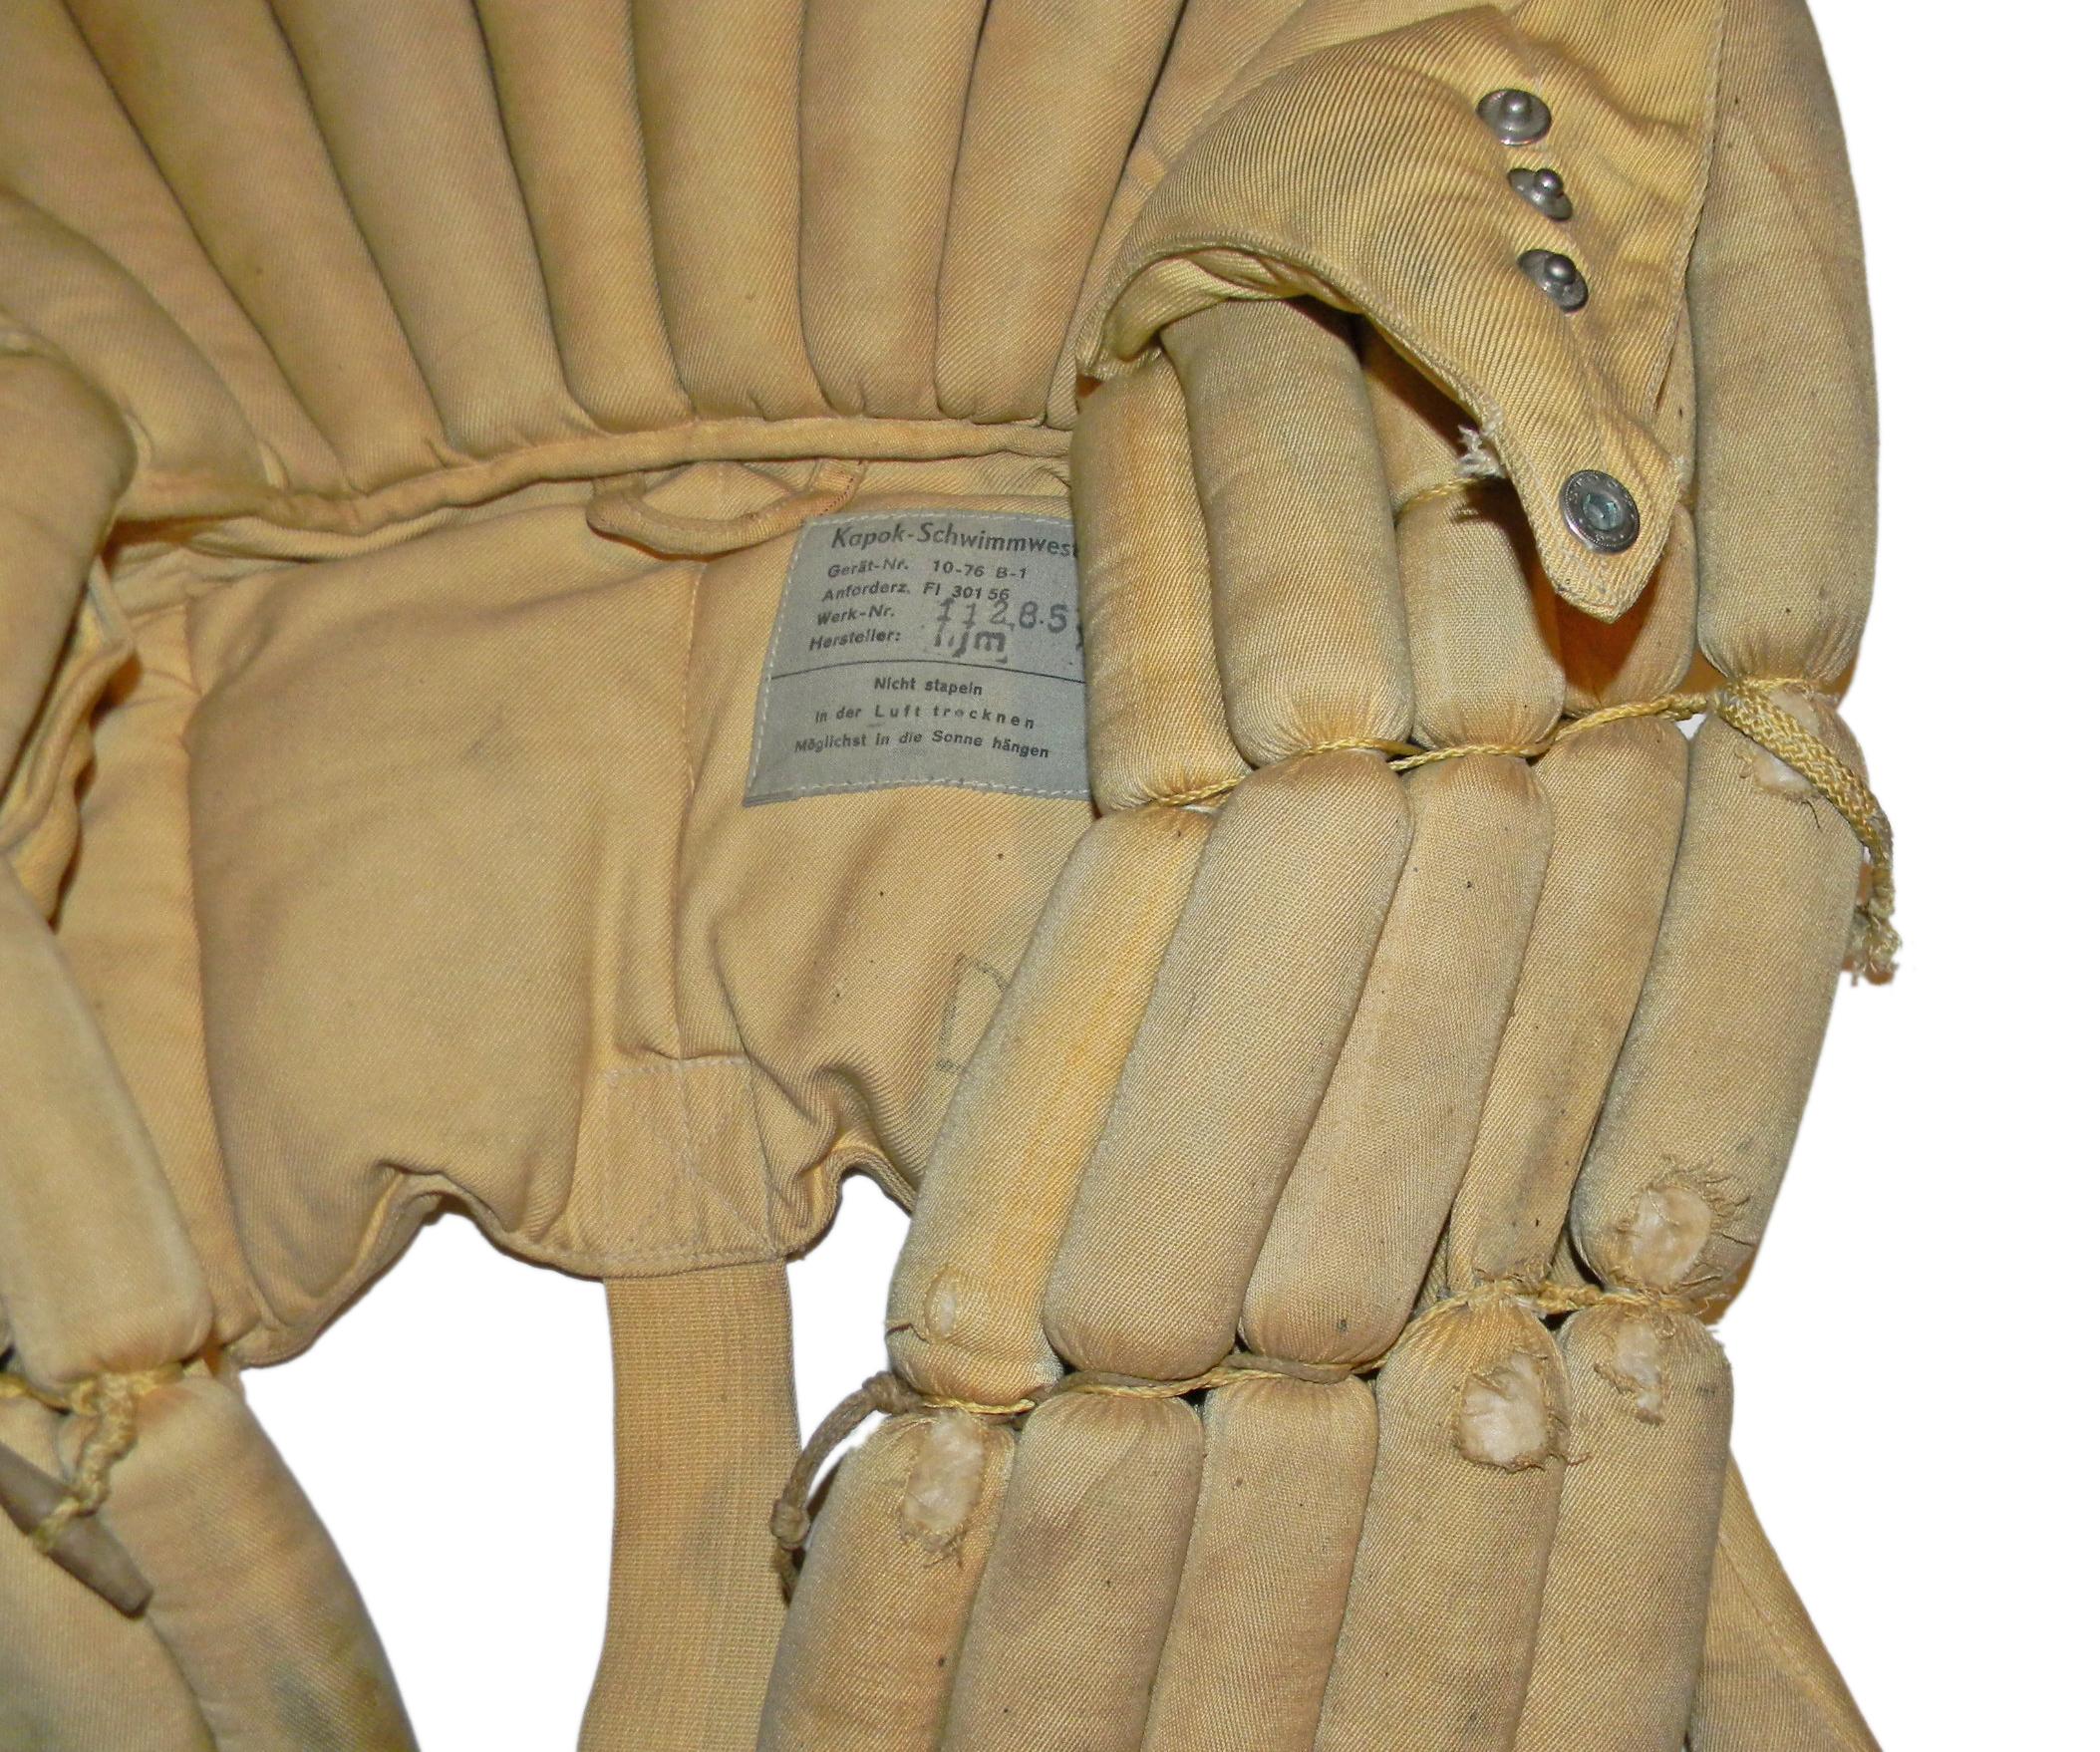 LW kapok model 10-76B-1 life vest